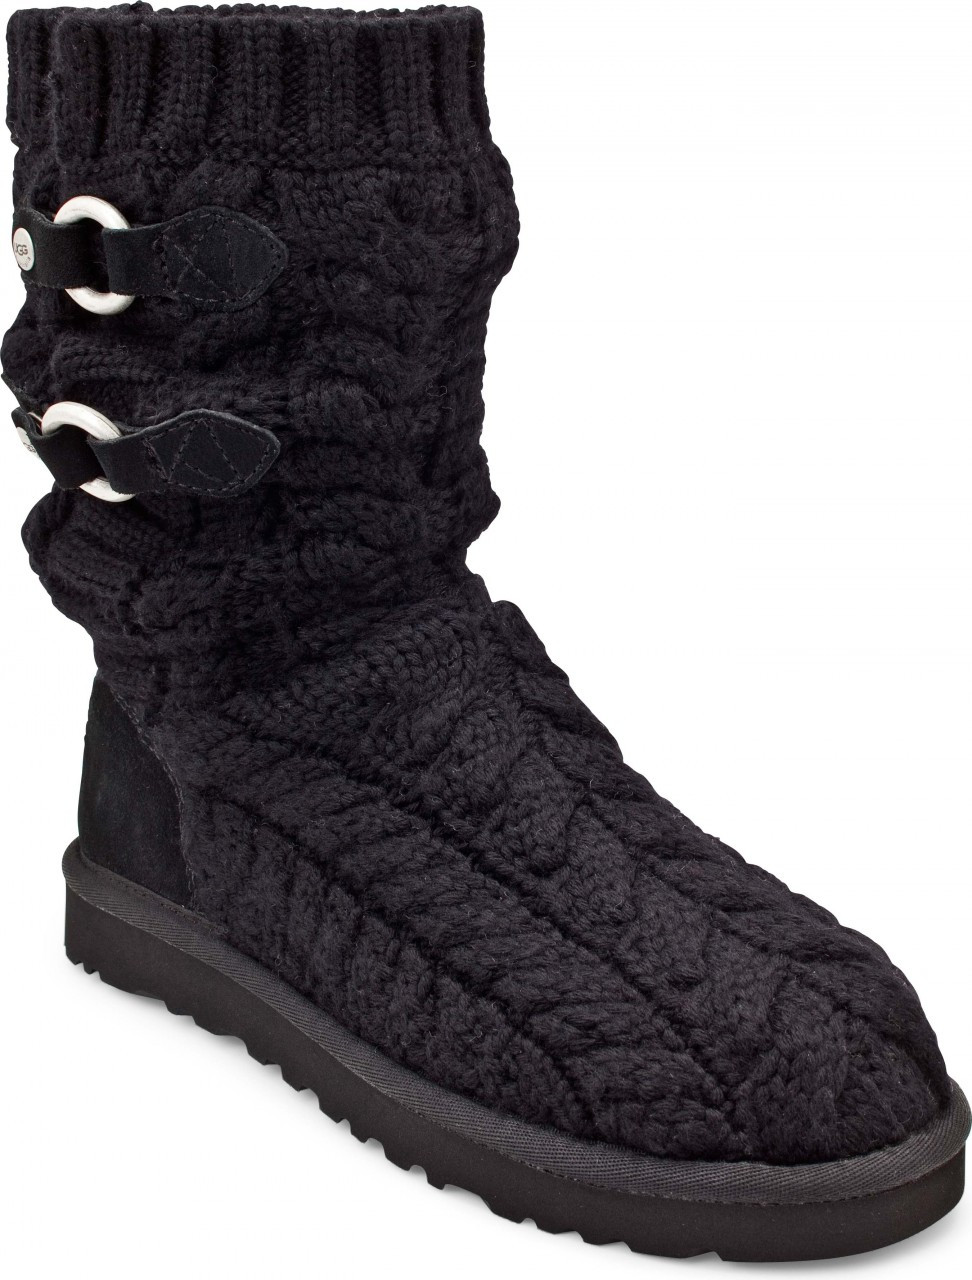 05212b25e57 Ugg Australia Womens Tularosa Route Cable Boots - cheap watches mgc ...